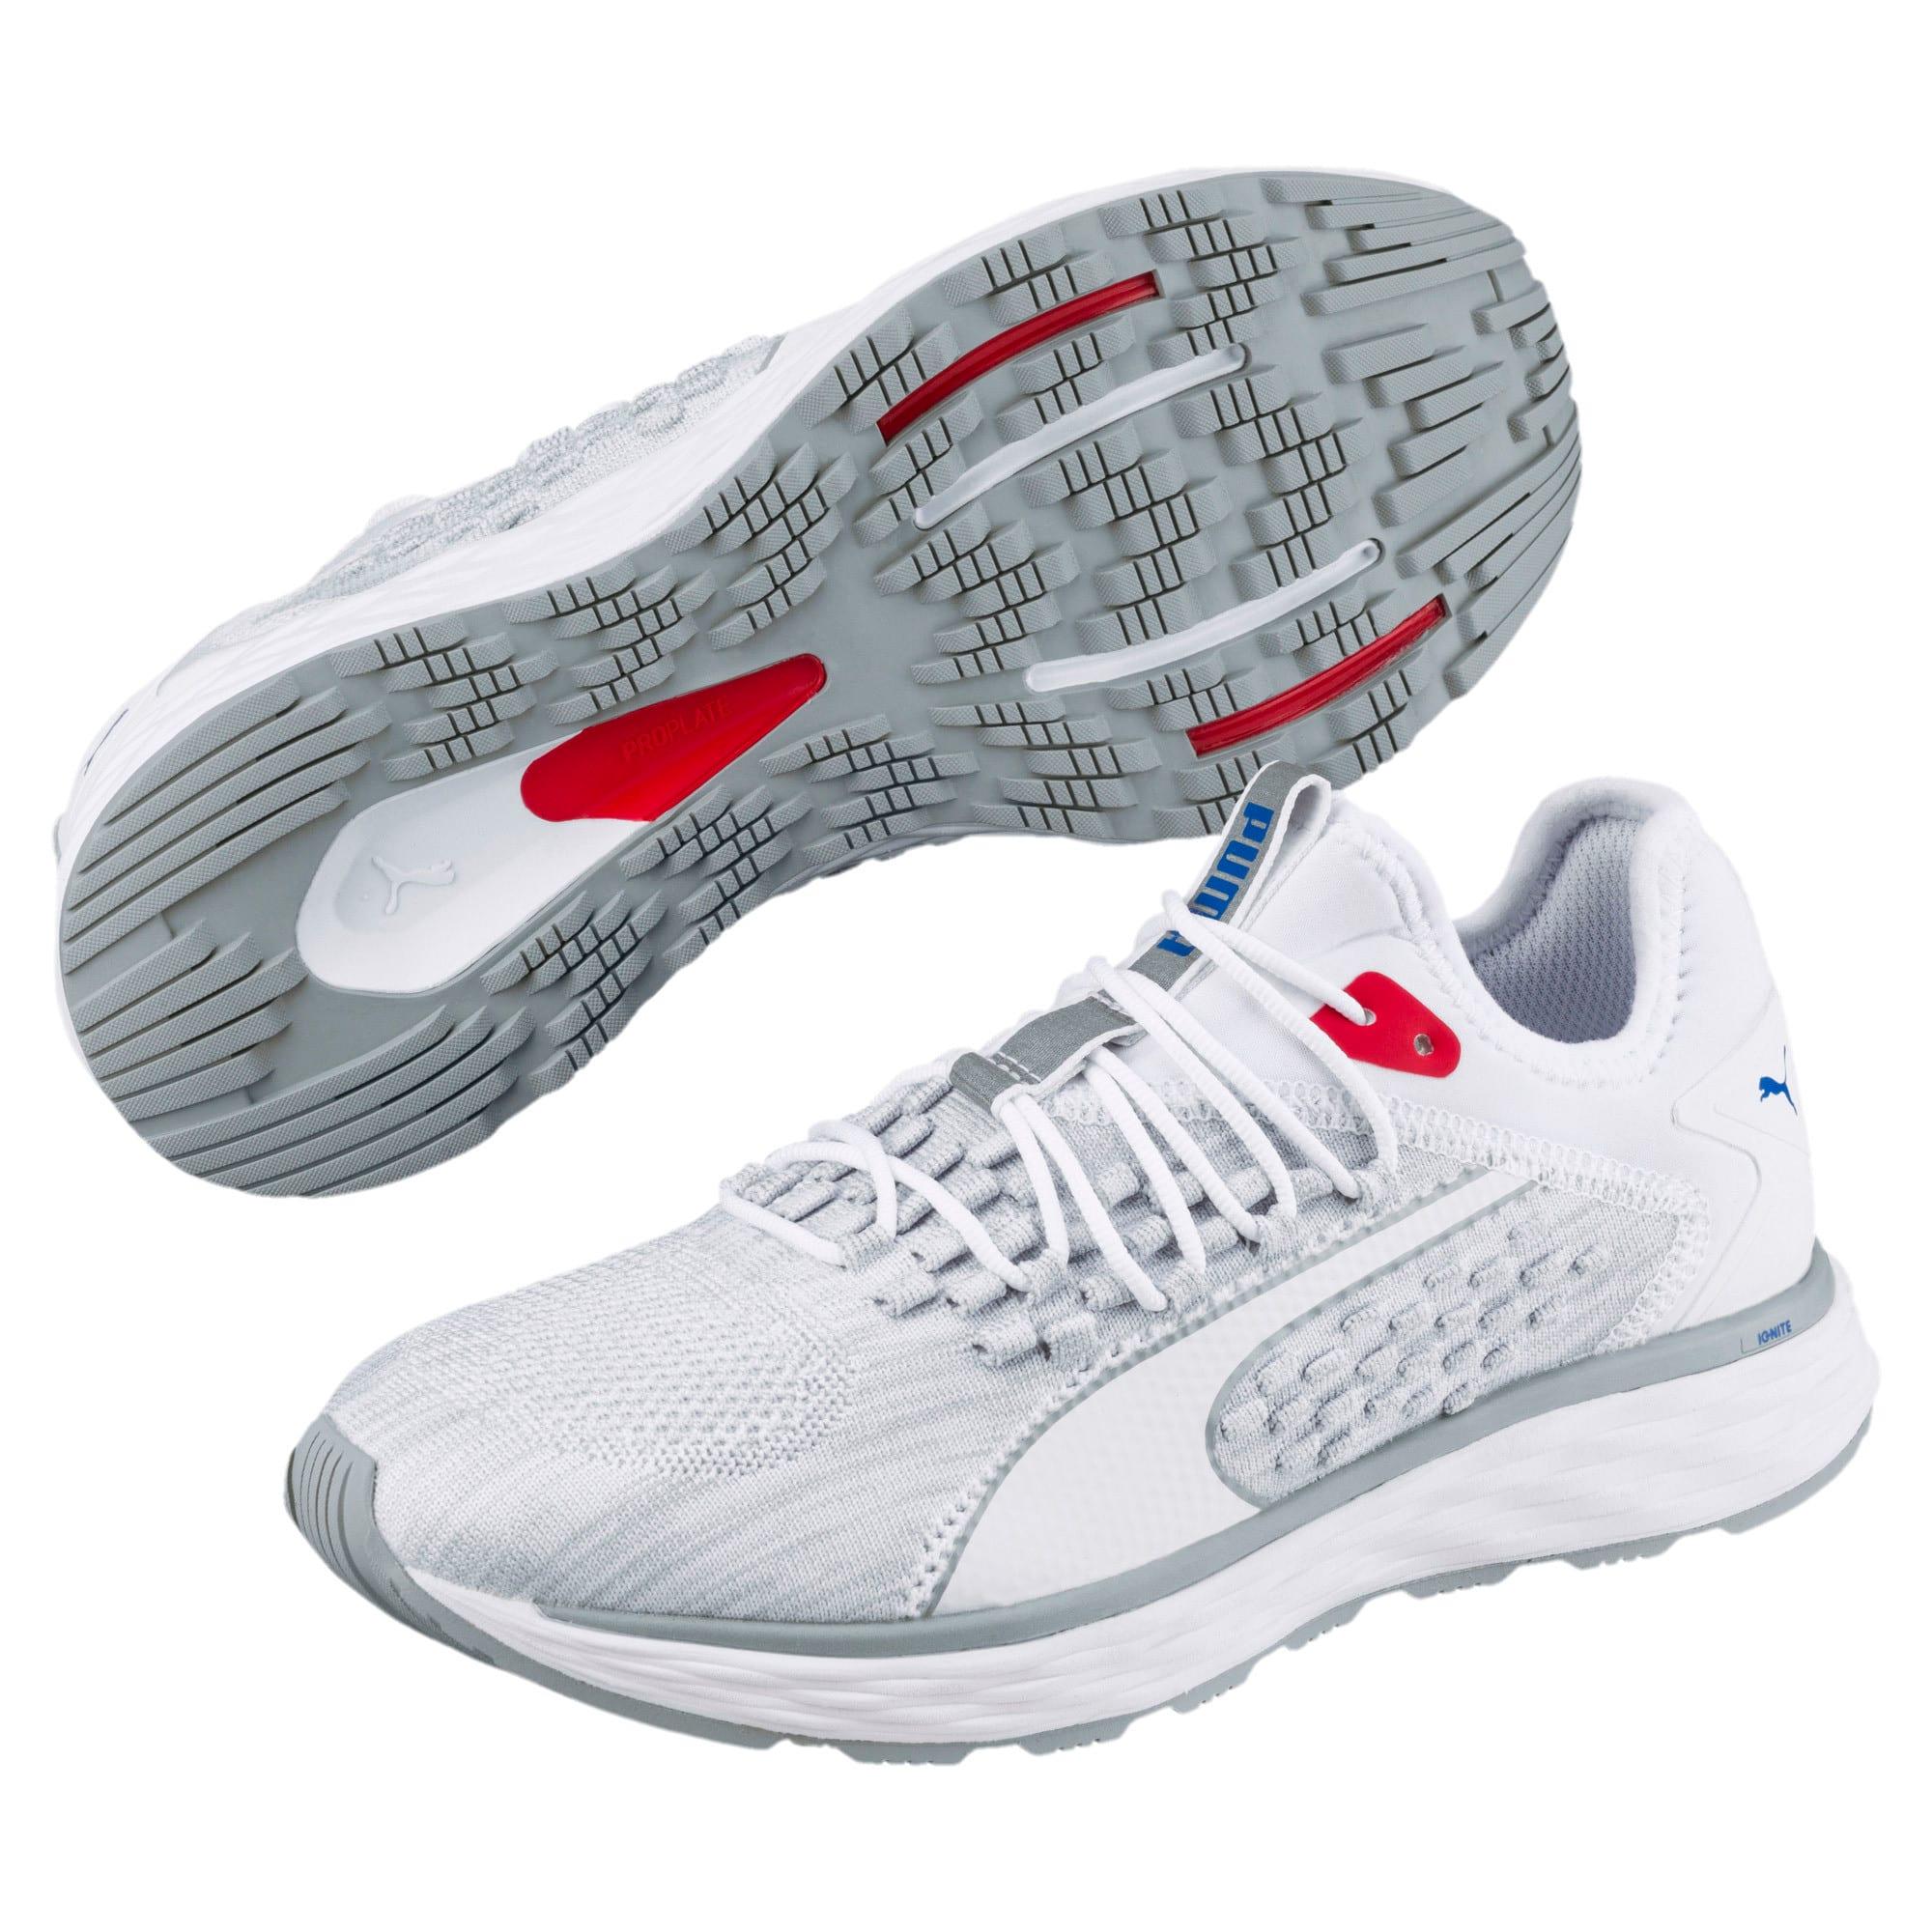 Thumbnail 4 of SPEED FUSEFIT Women's Running Shoes, Puma White-Quarry, medium-IND